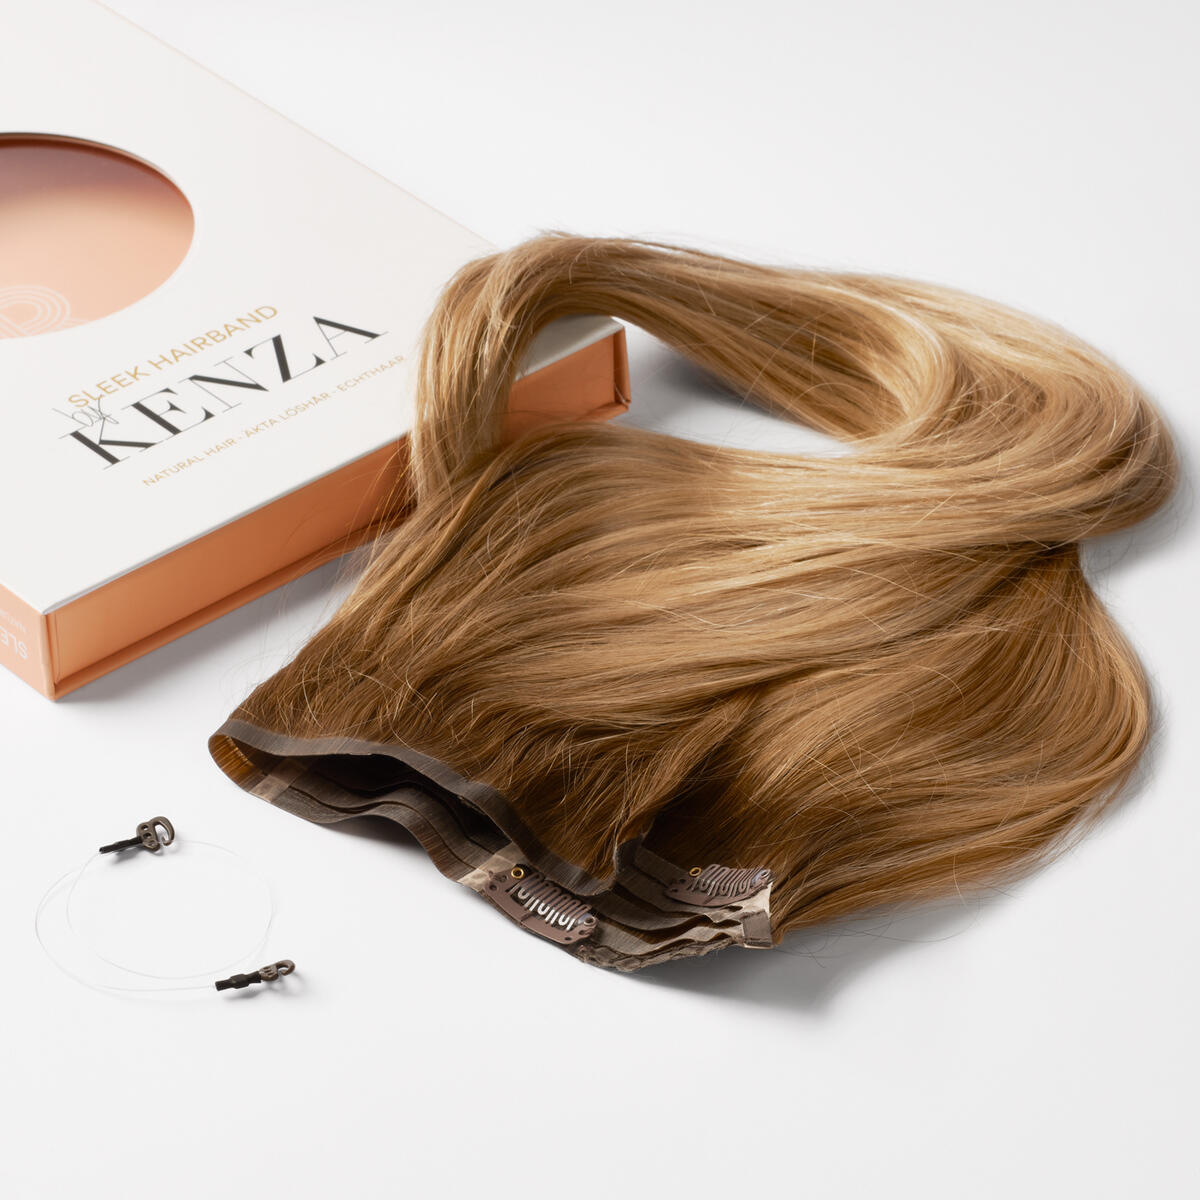 Sleek Hairband C2.0/7.4 Caramel Bronde ColorMelt 50 cm